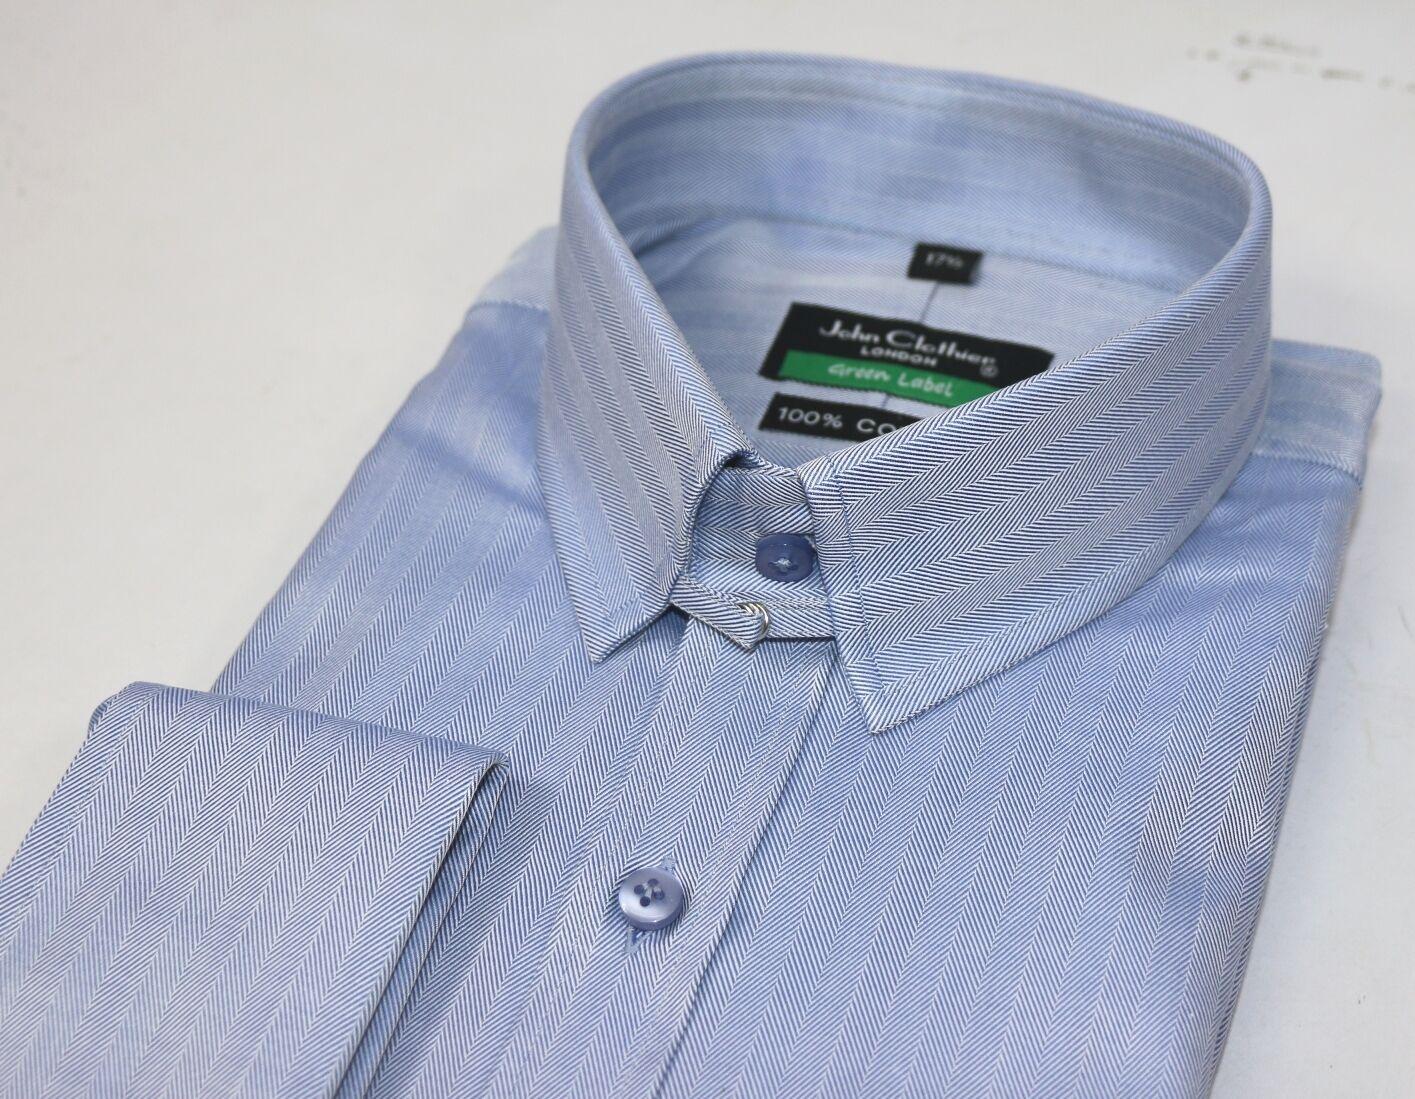 Herren Tab Collar Weiß Shirt Cufflinks Gents Herringbone Loop collar Bond James